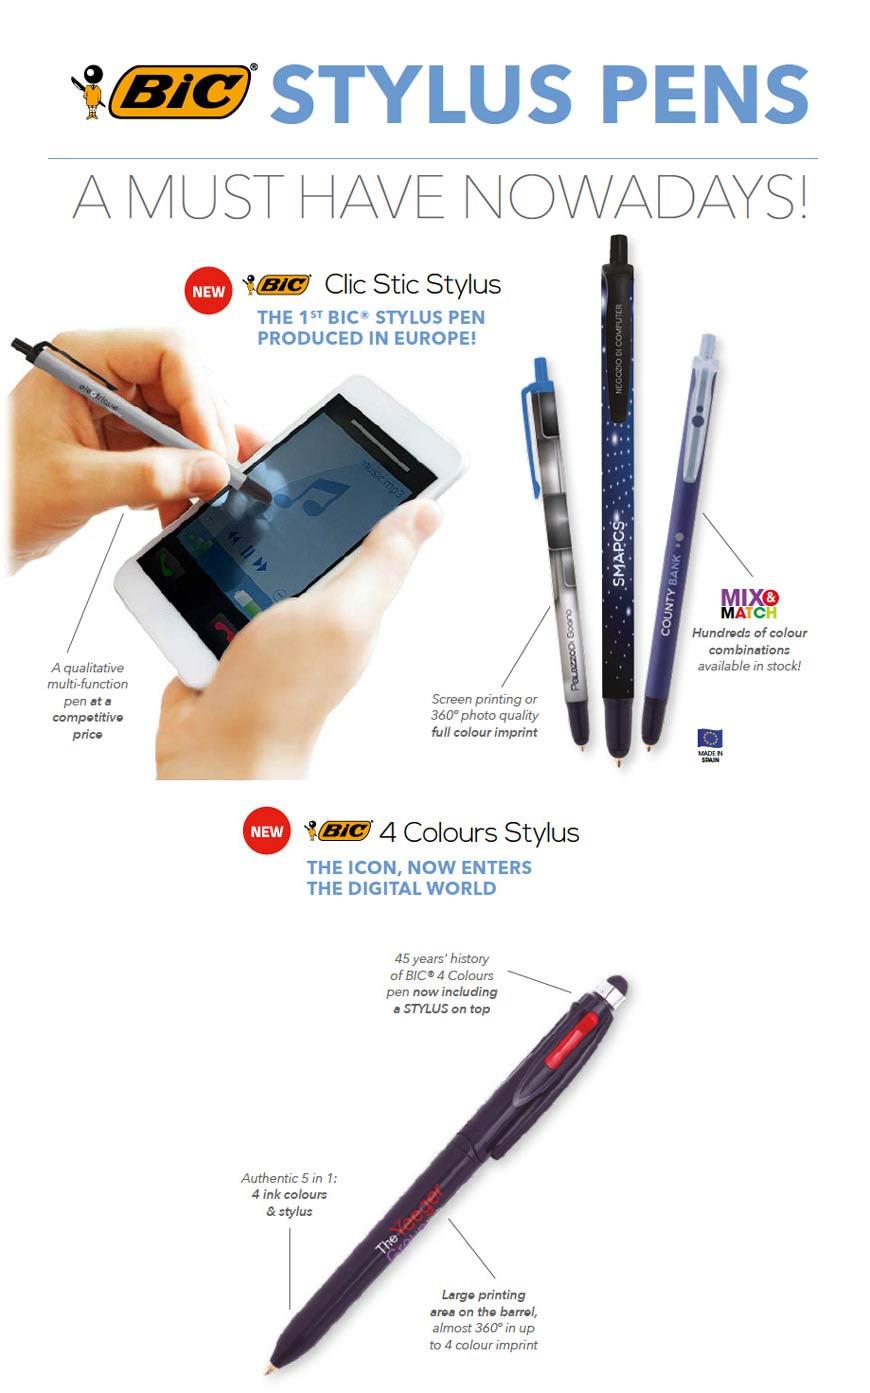 stylus_pens-bic.jpg